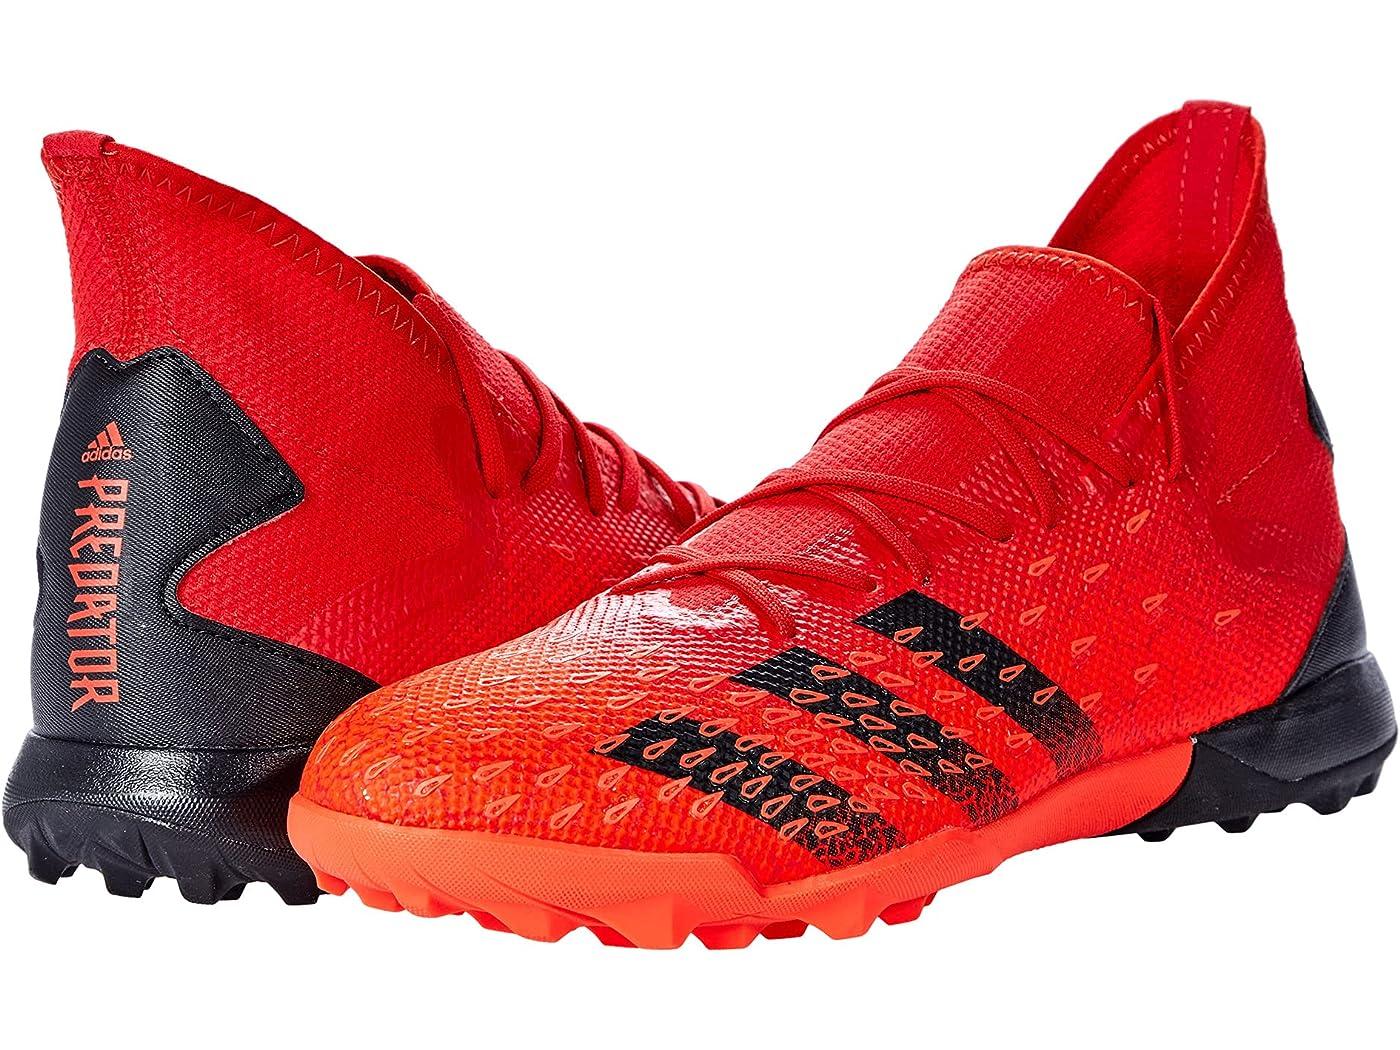 Adidas Predator Freak 3 Turf